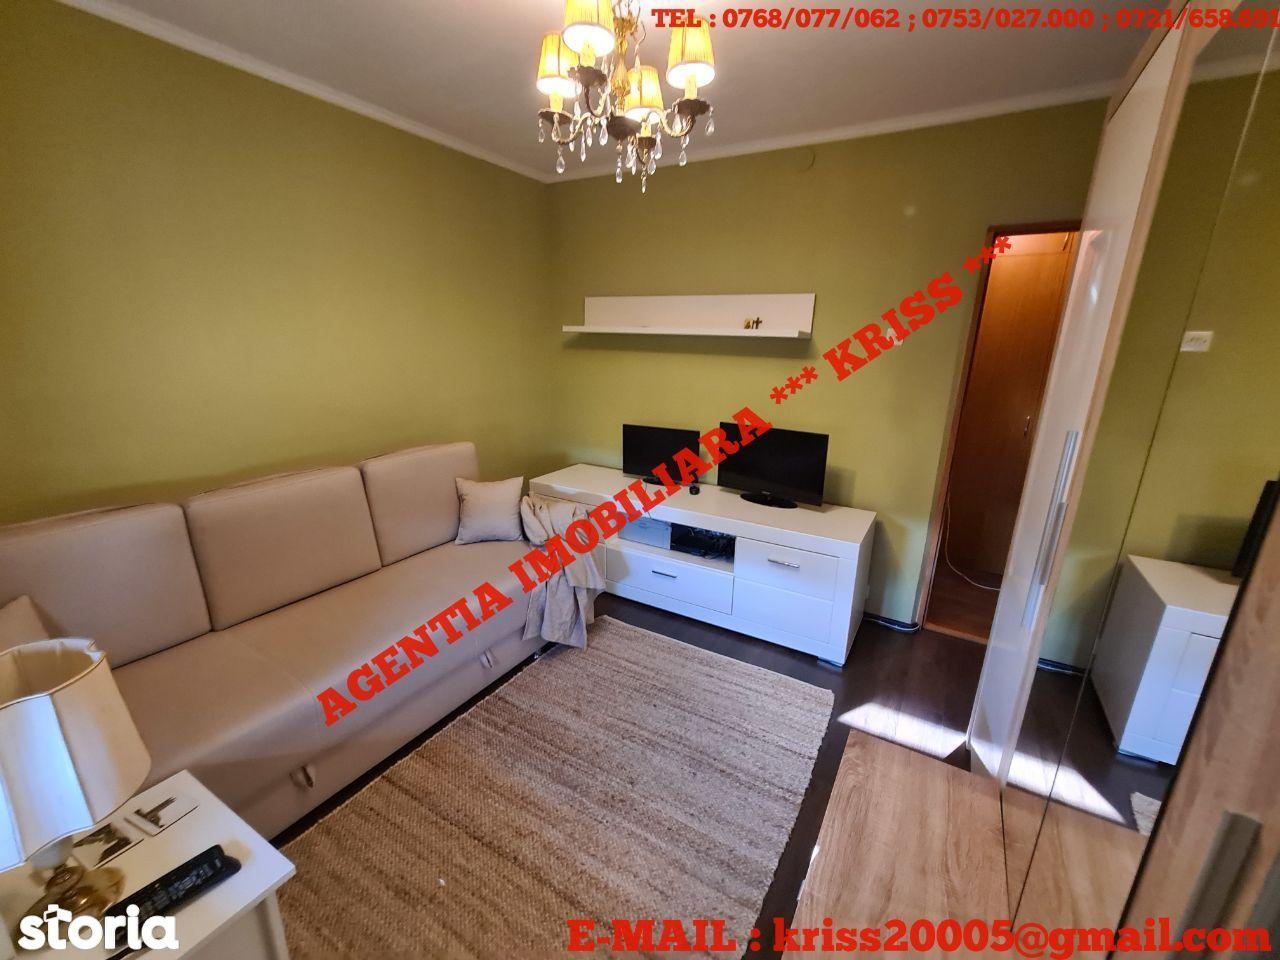 APARTAMENT 2 Camere CRAIOVEI-BOEMA Confort 1 DEC. Centrală Mobilat